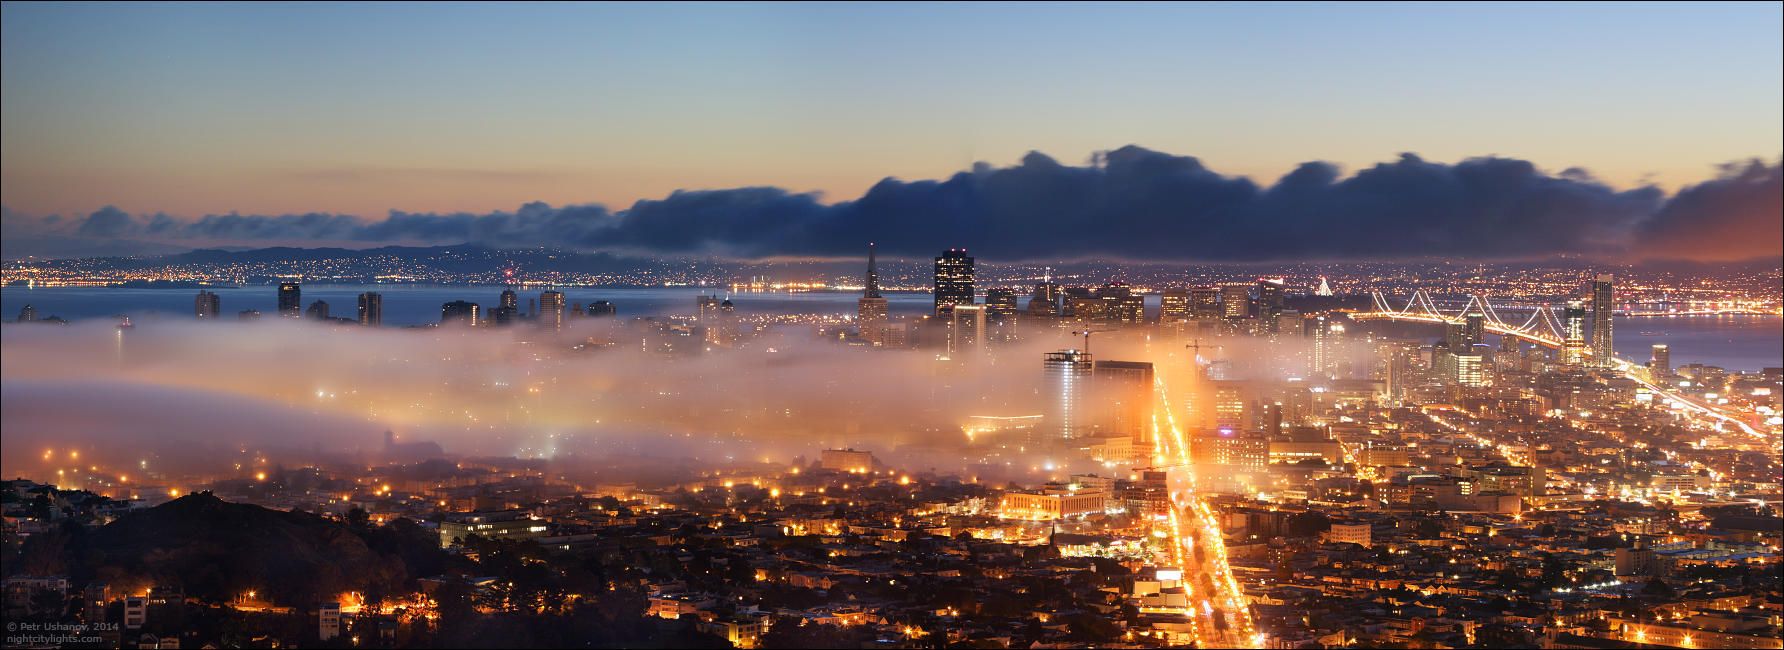 SFpanorama07 Сан Франциско   панорамы города